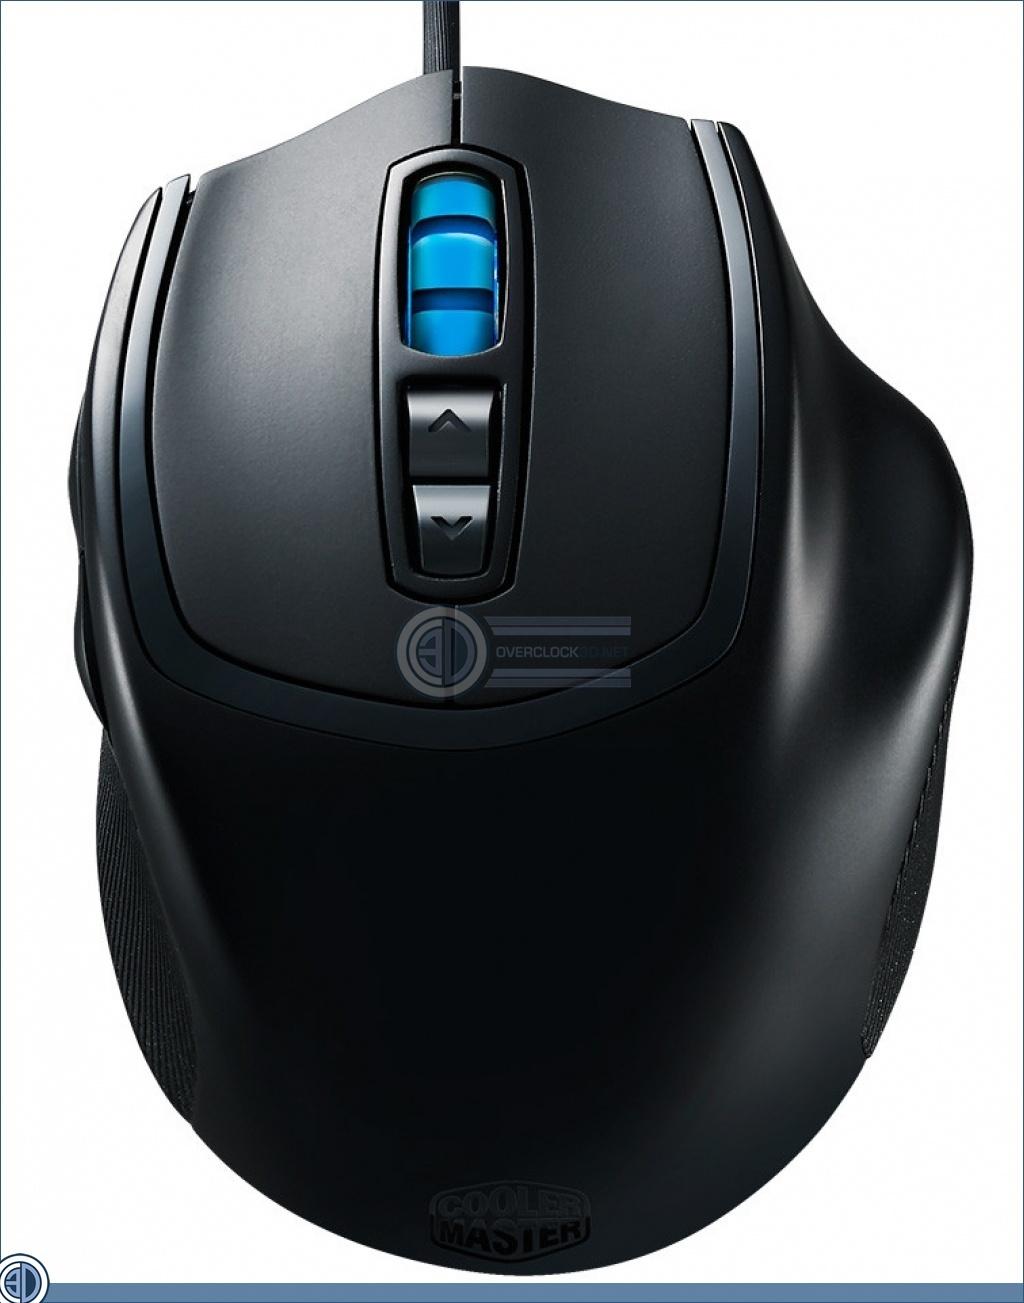 Cooler Master Announces Cm Storm Xornet Ii Gaming Mouse